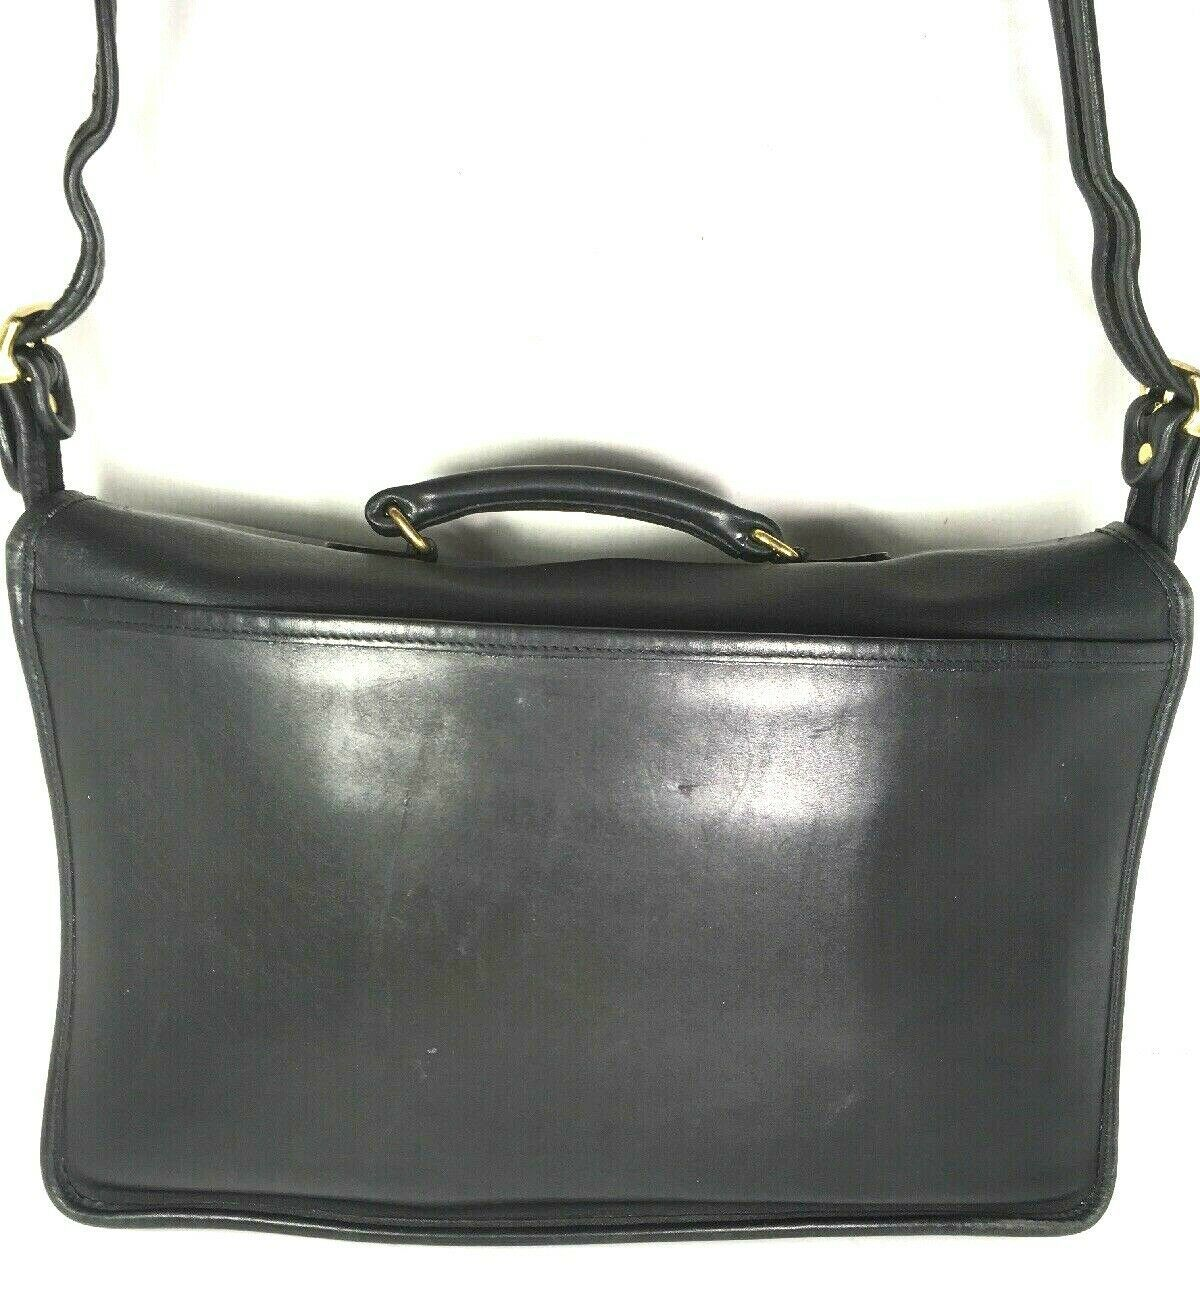 Coach Vintage Black Leather Briefcase Adjustable Strap